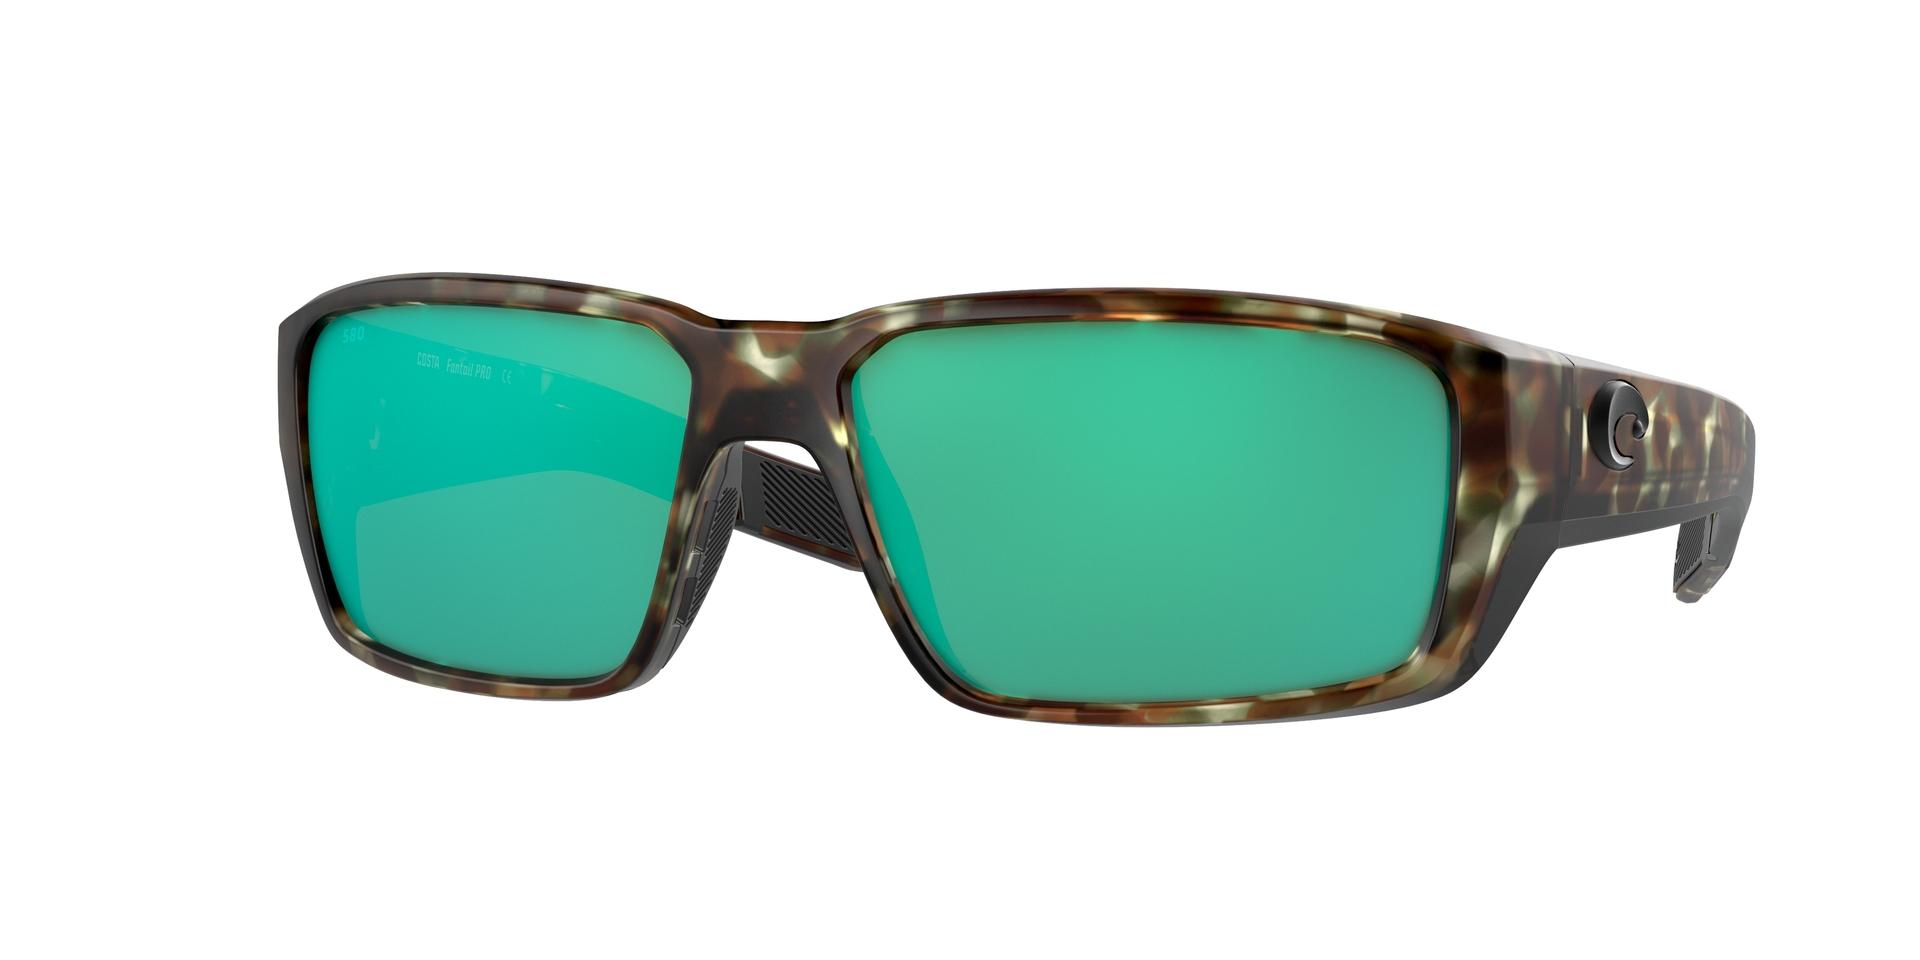 Costa Fantail Pro Frames